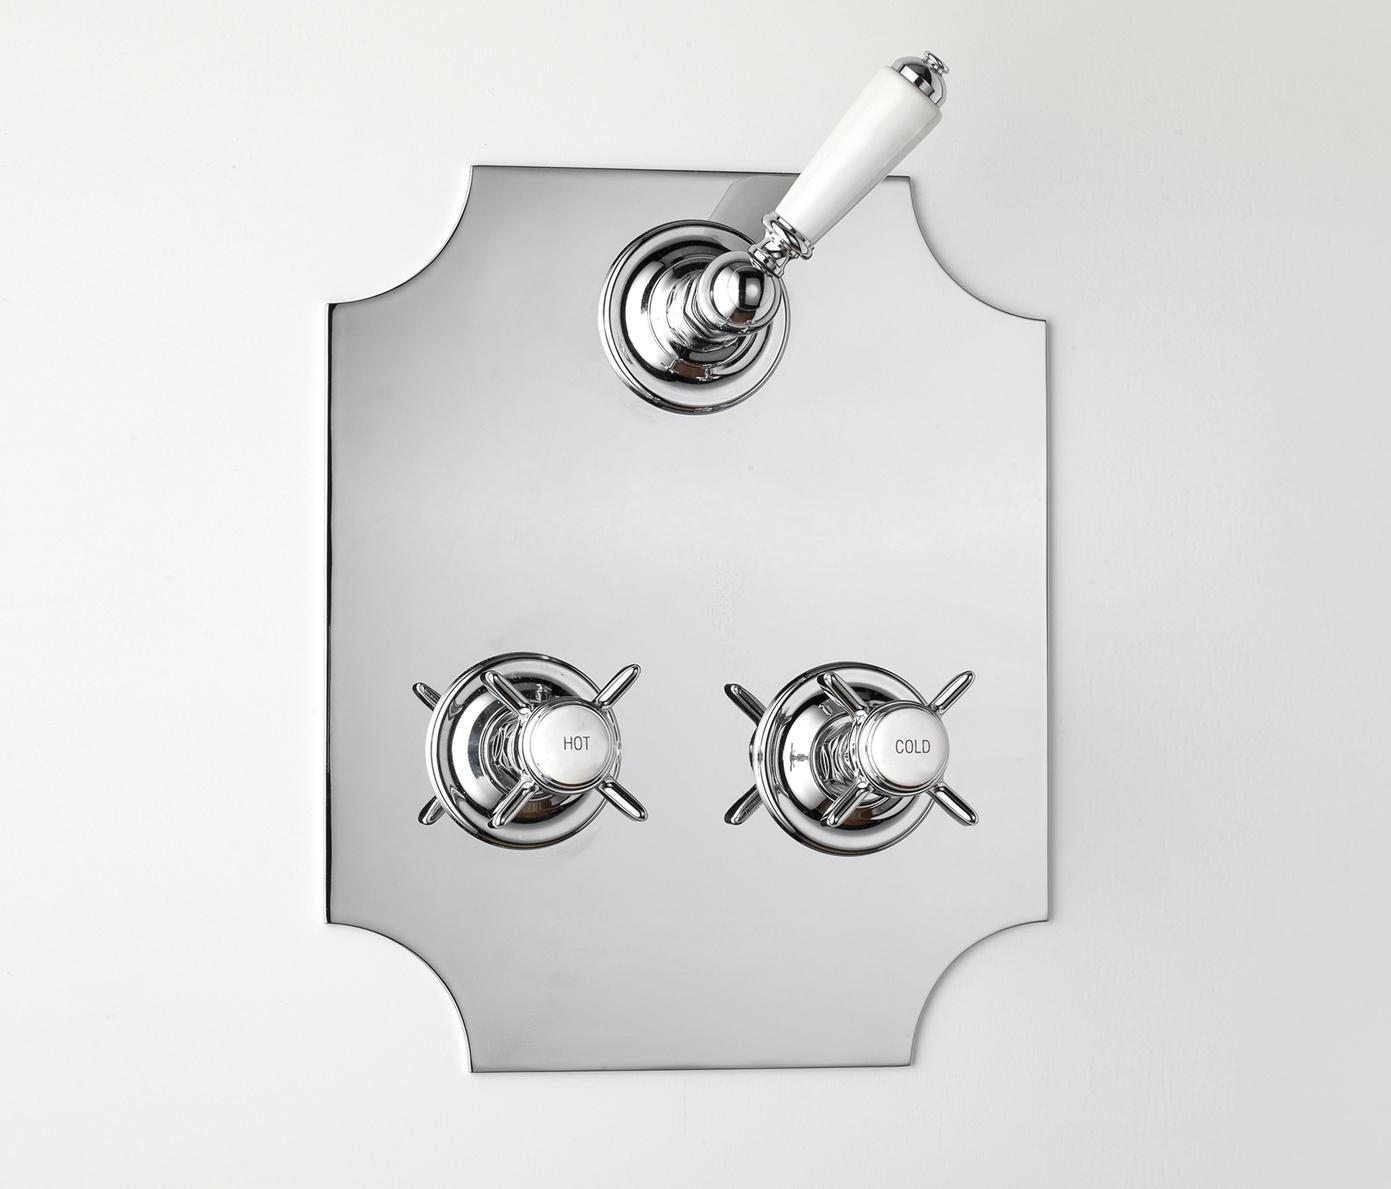 Coventry mezcladora para ducha grifer a para duchas de for Mezcladora para ducha precio